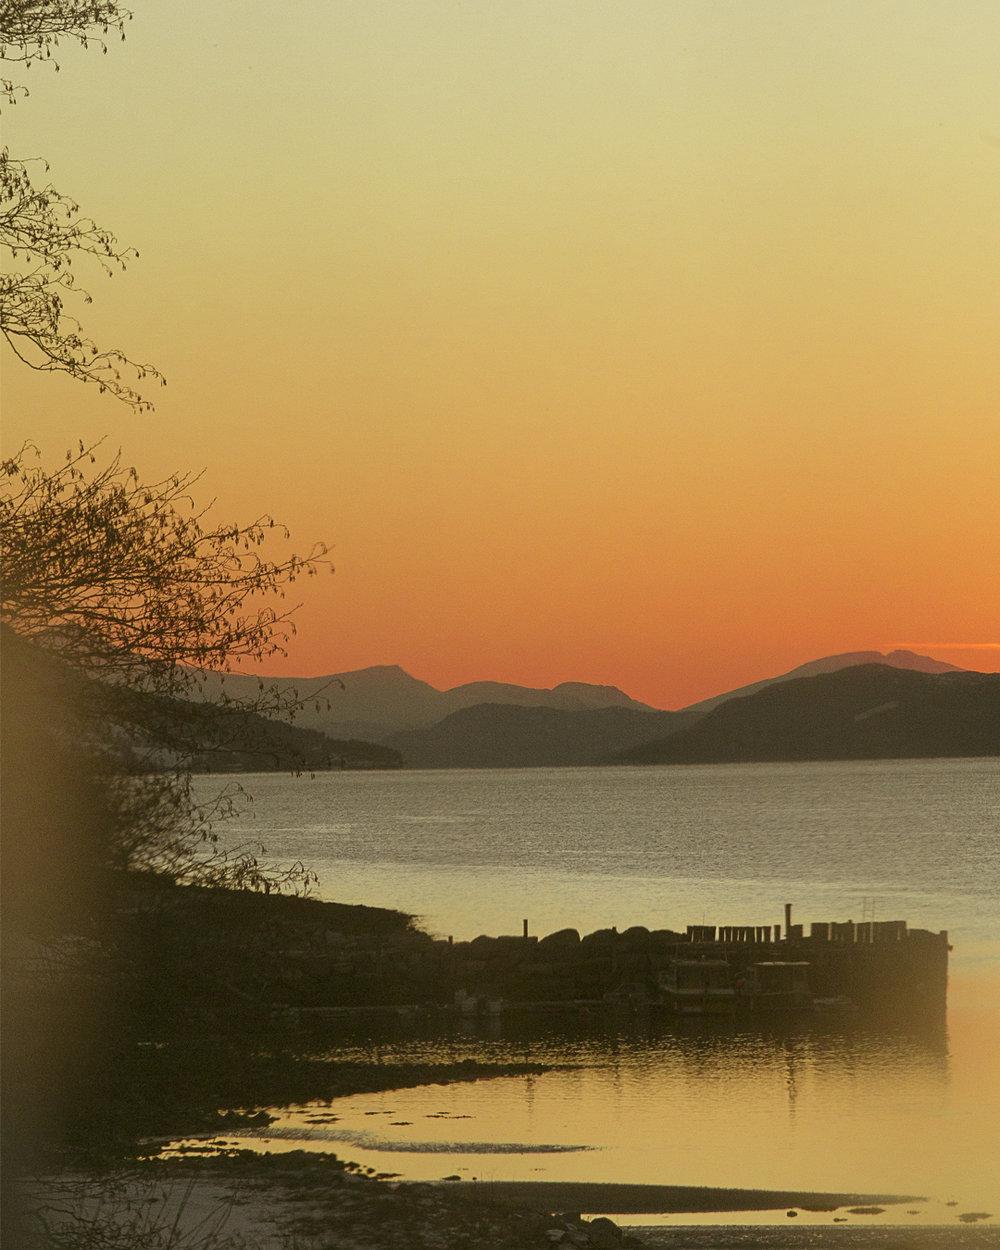 Eidsvågneset, Møre og Romsdal